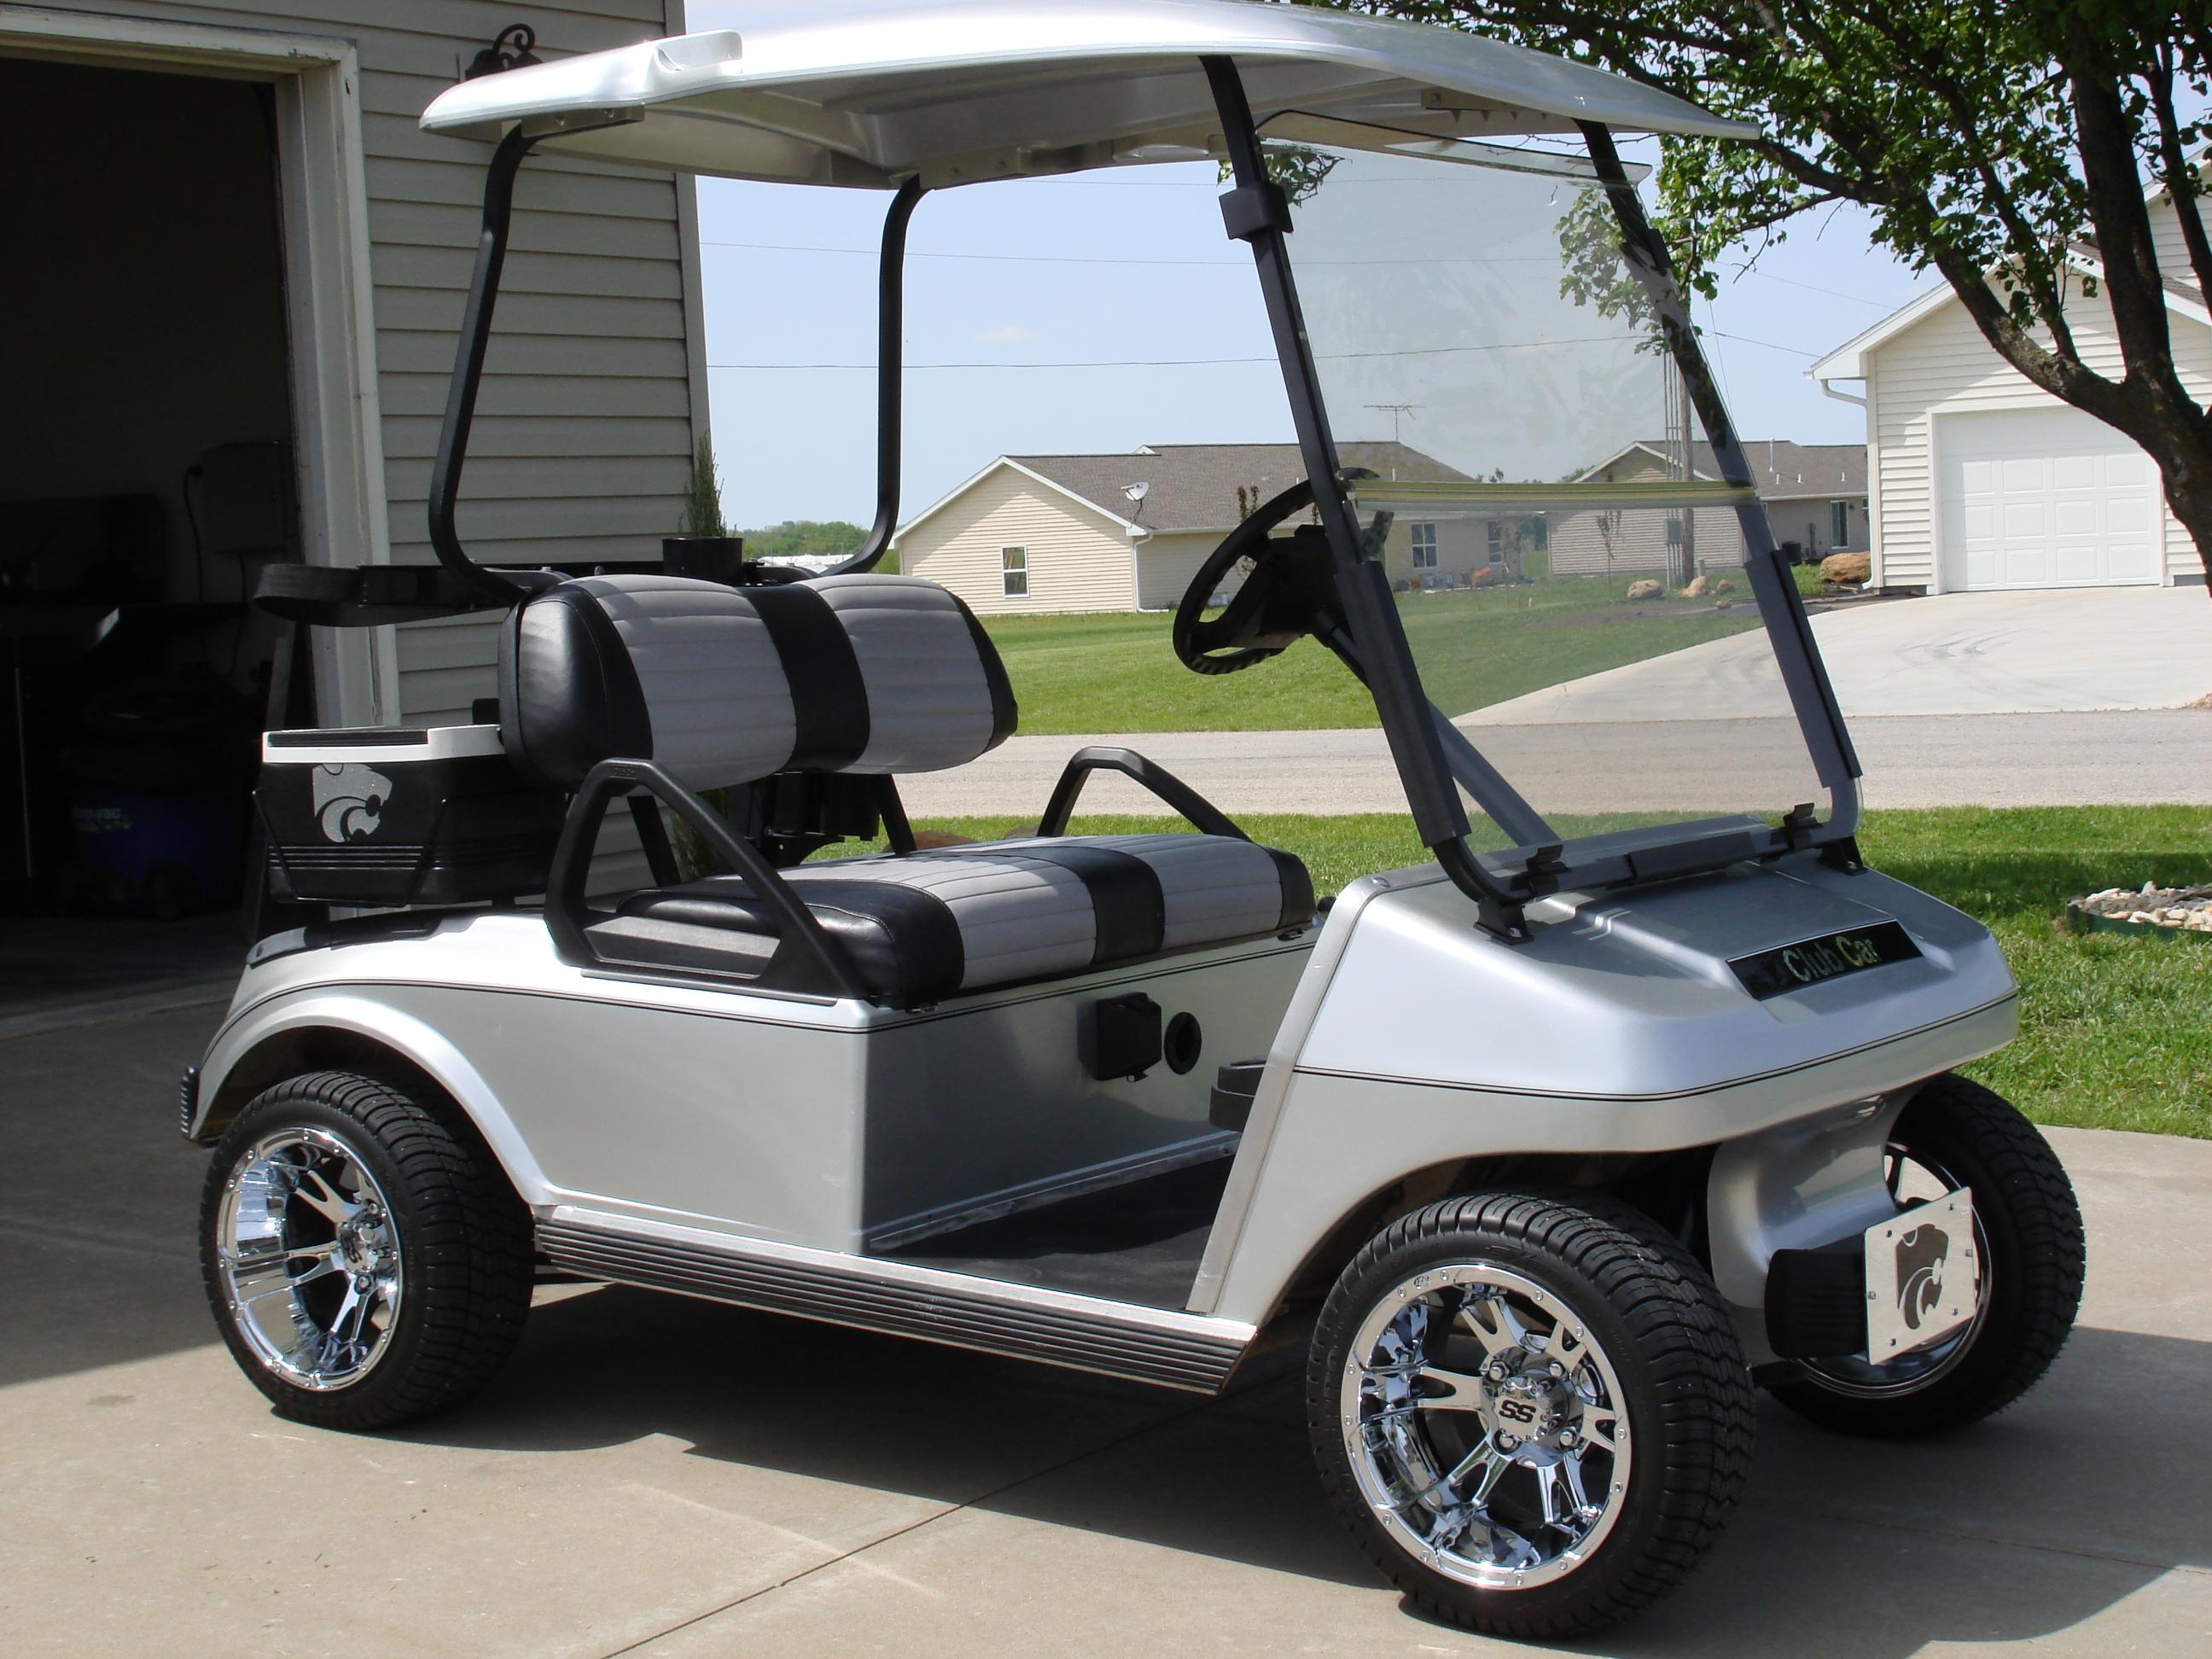 club car ds 48v wiring diagram dolgular com 1983 Club Car Wiring Diagram  Club Car Golf Cart Service Diagram Club Car Golf Cart Manual Club Car Golf Cart Custom Seats